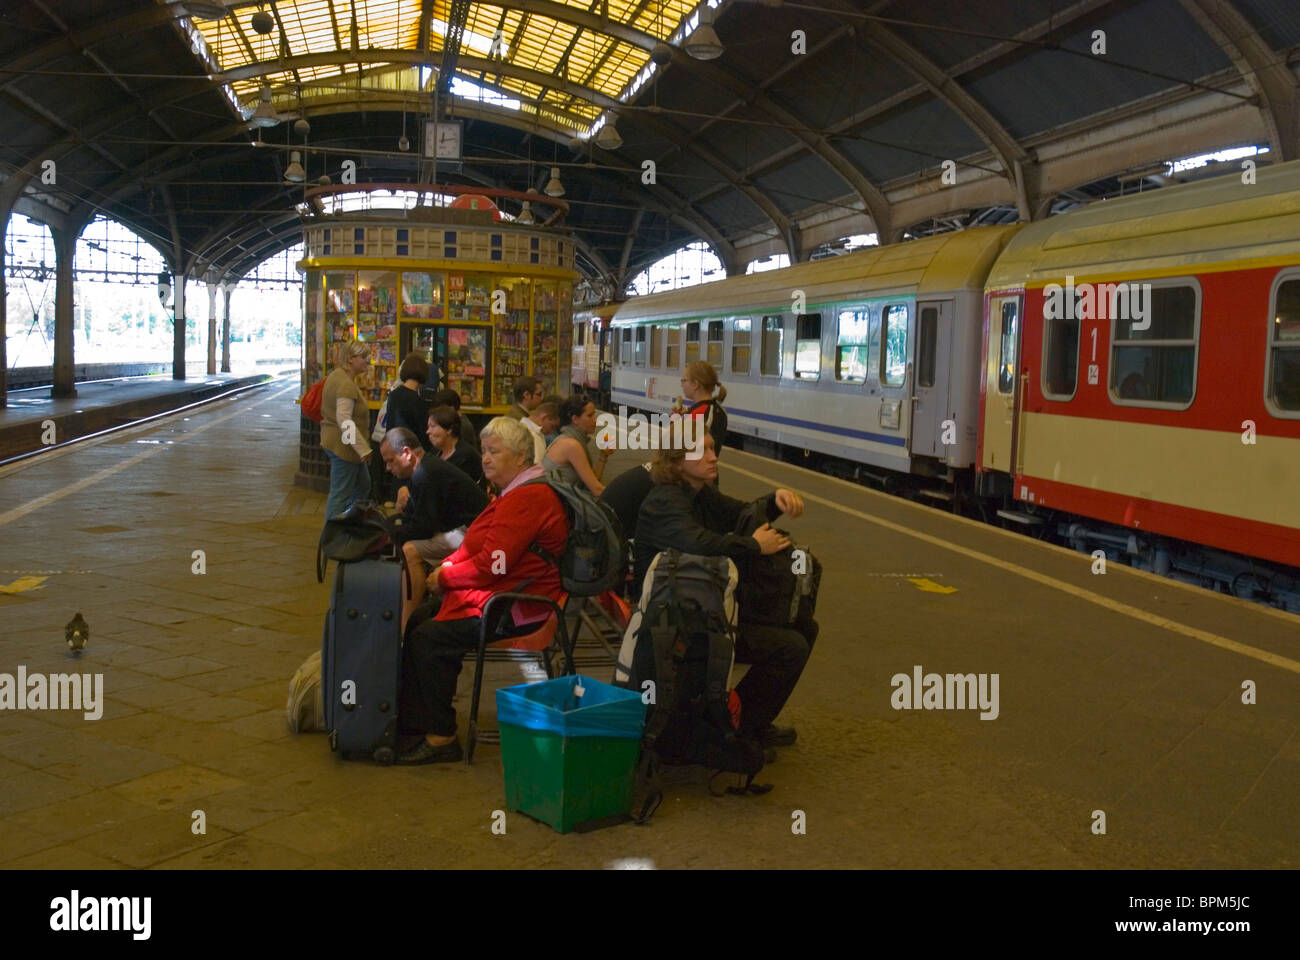 Glowny the main railway station Wroclaw Silesia Poland Europe Stock Photo